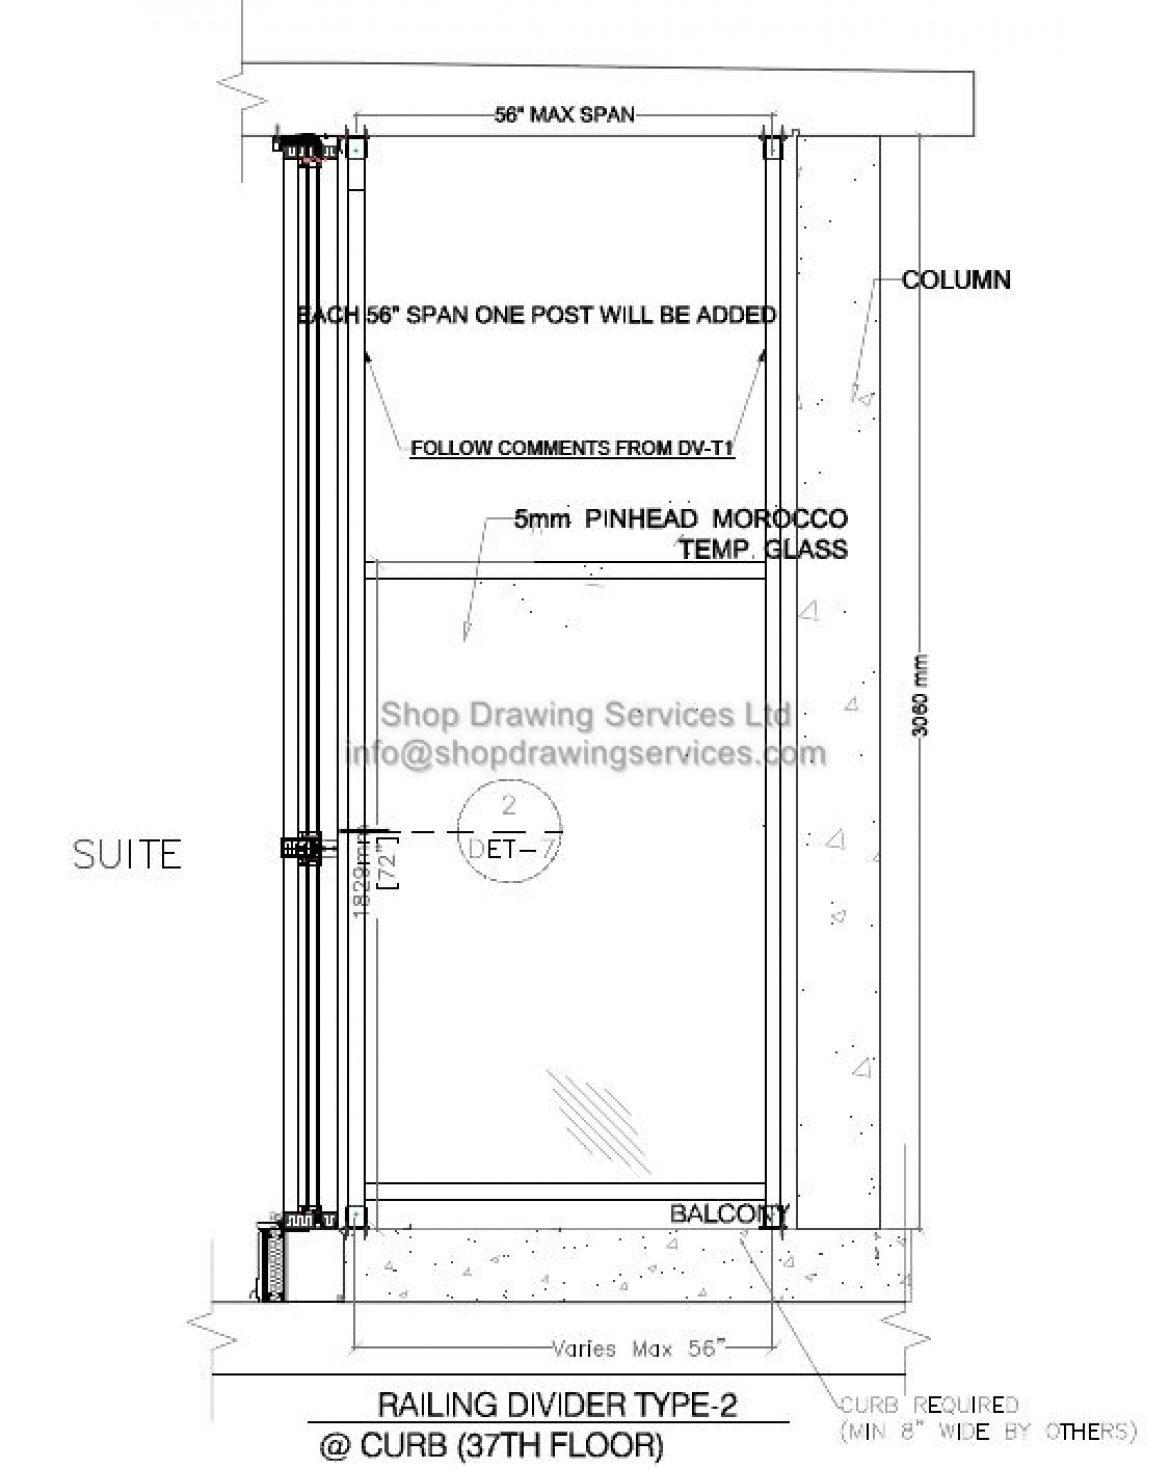 High Rise Aluminum Divider Shop Drawings